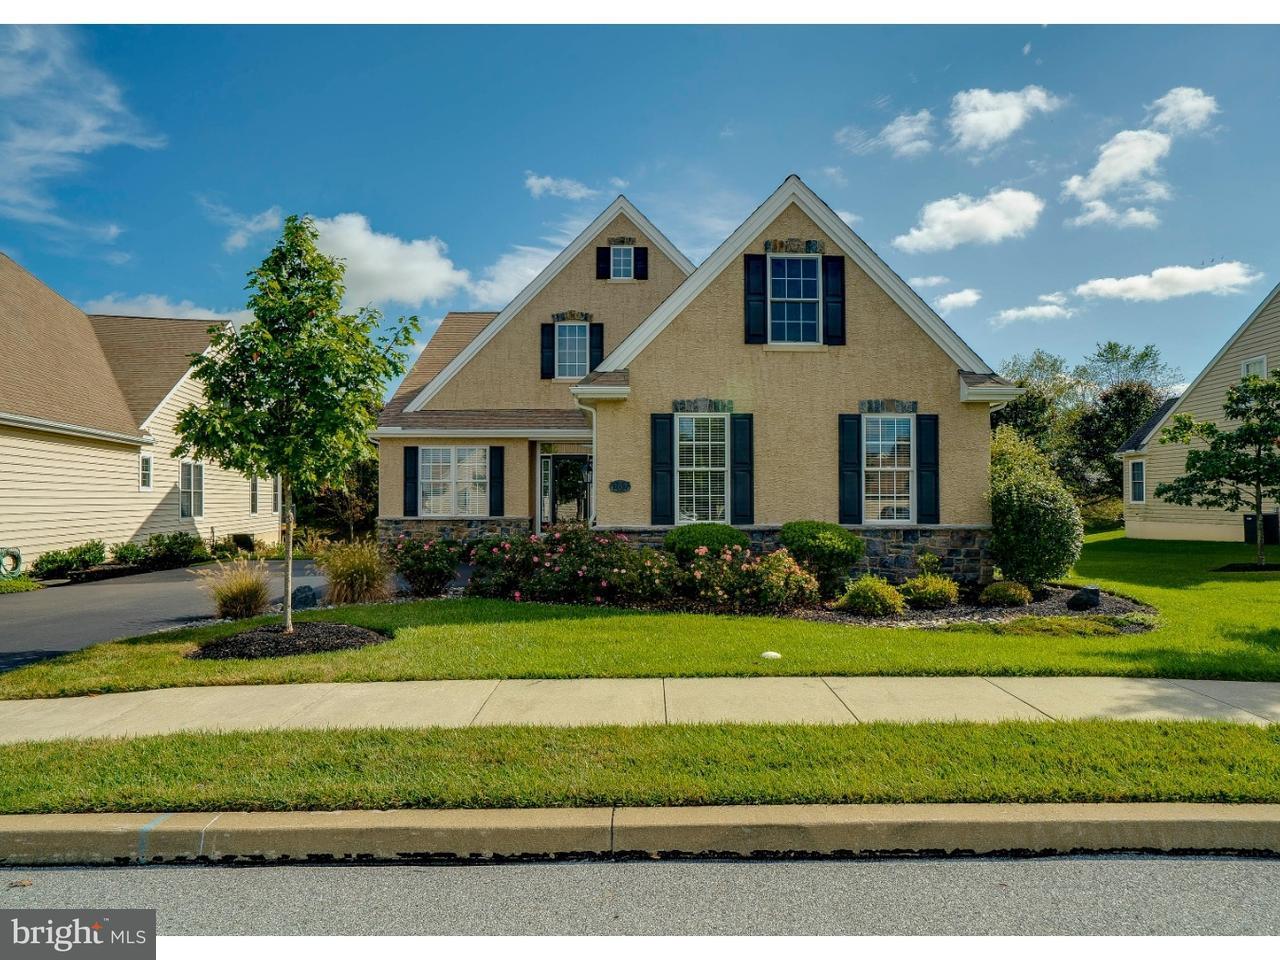 Casa Unifamiliar por un Alquiler en 202 CRESCENT RD #13 Landenberg, Pennsylvania 19350 Estados Unidos